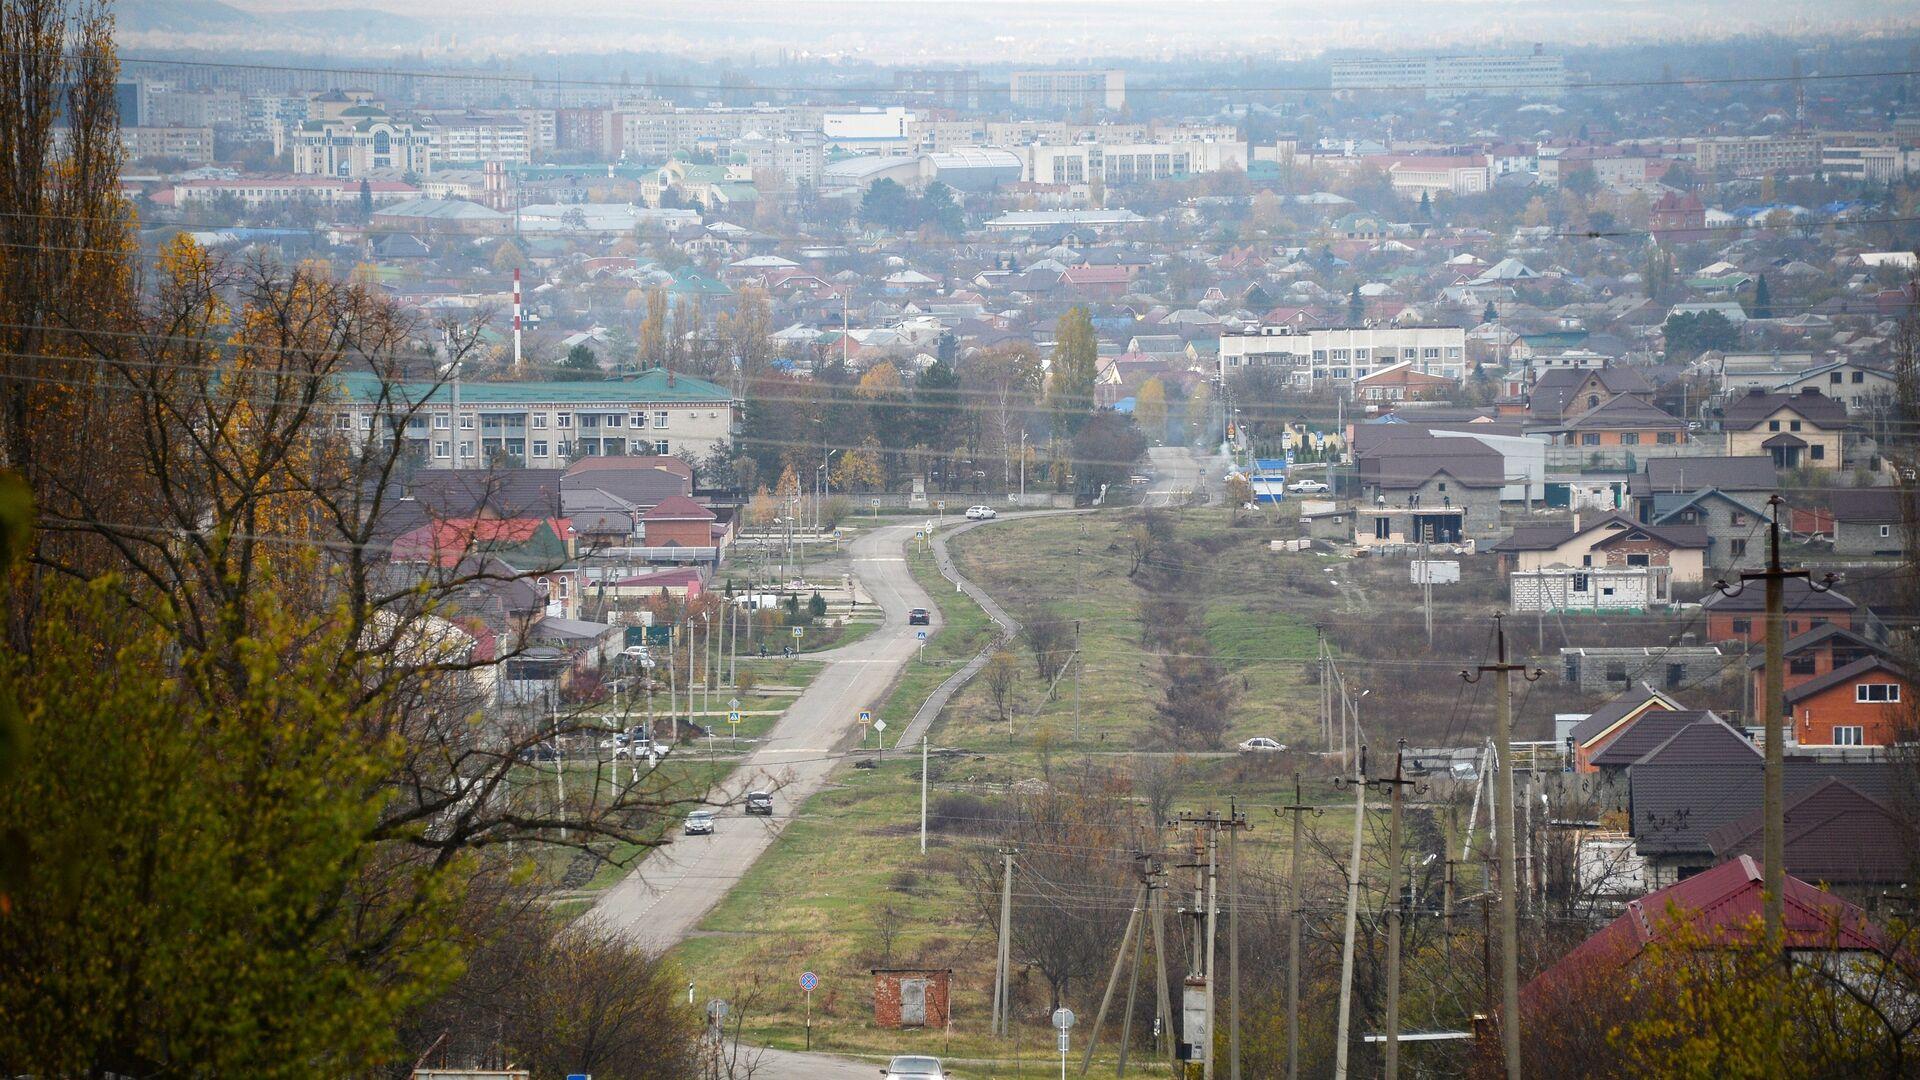 Вид на город Майкоп - РИА Новости, 1920, 28.10.2020